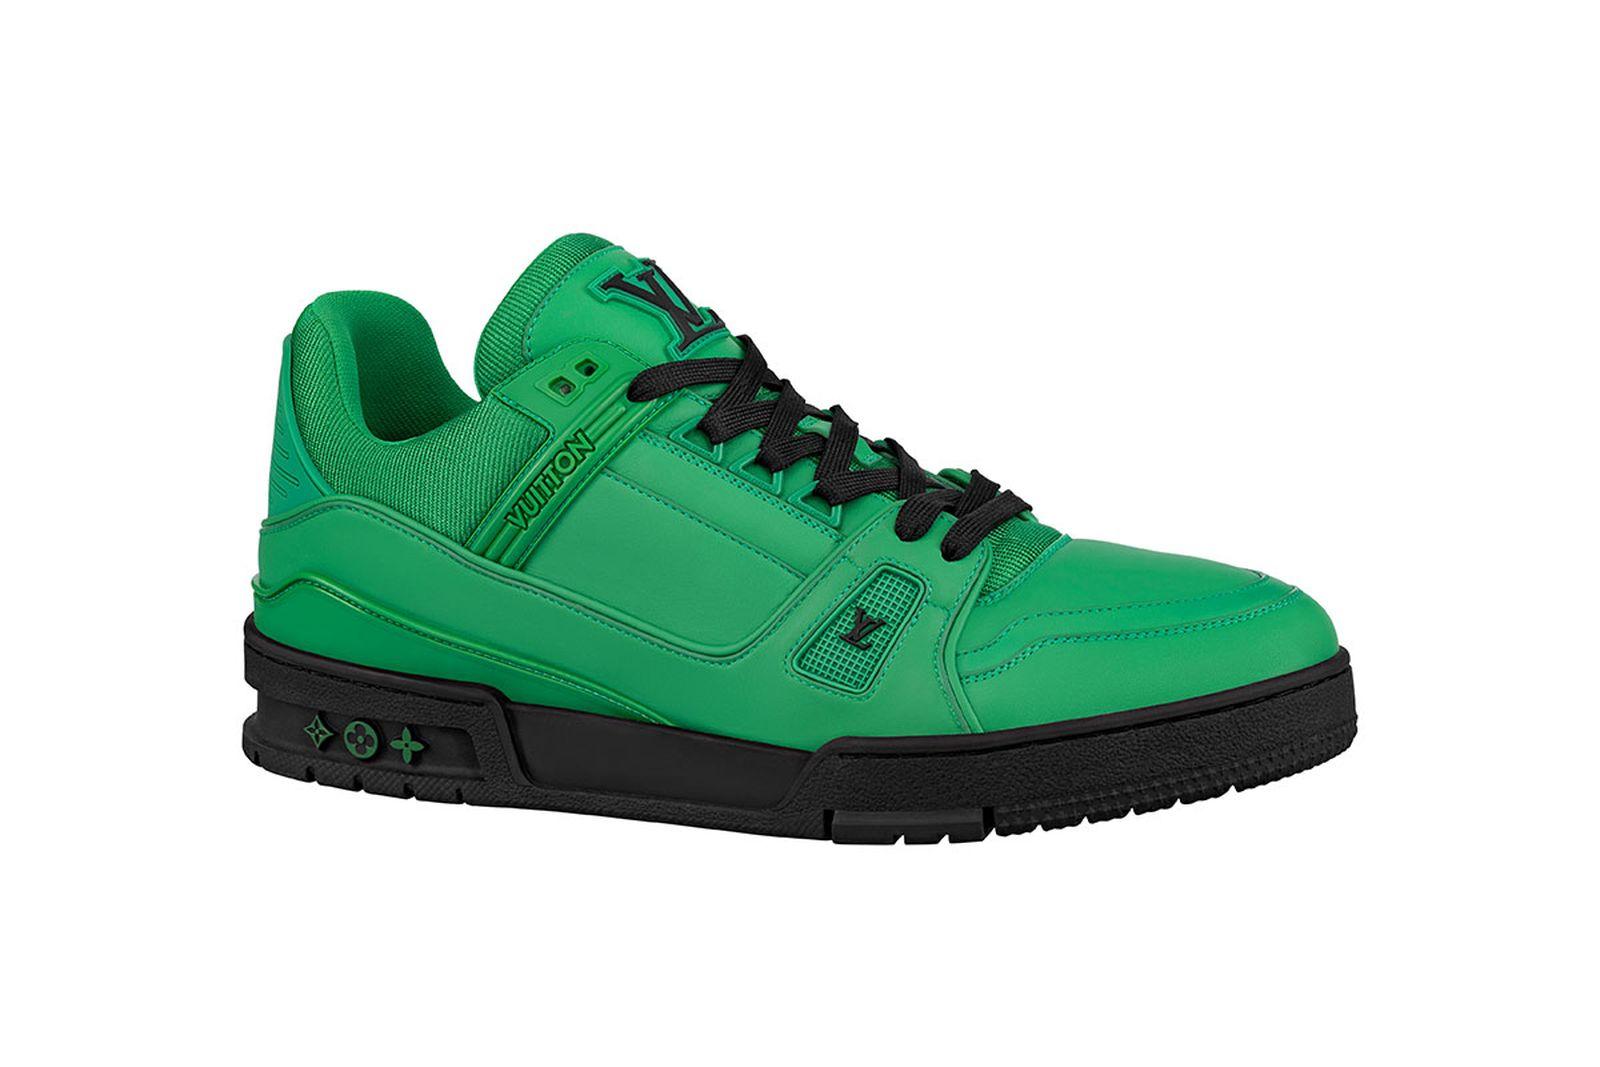 louis-vuitton-rainbow-outerwear-footwear-09